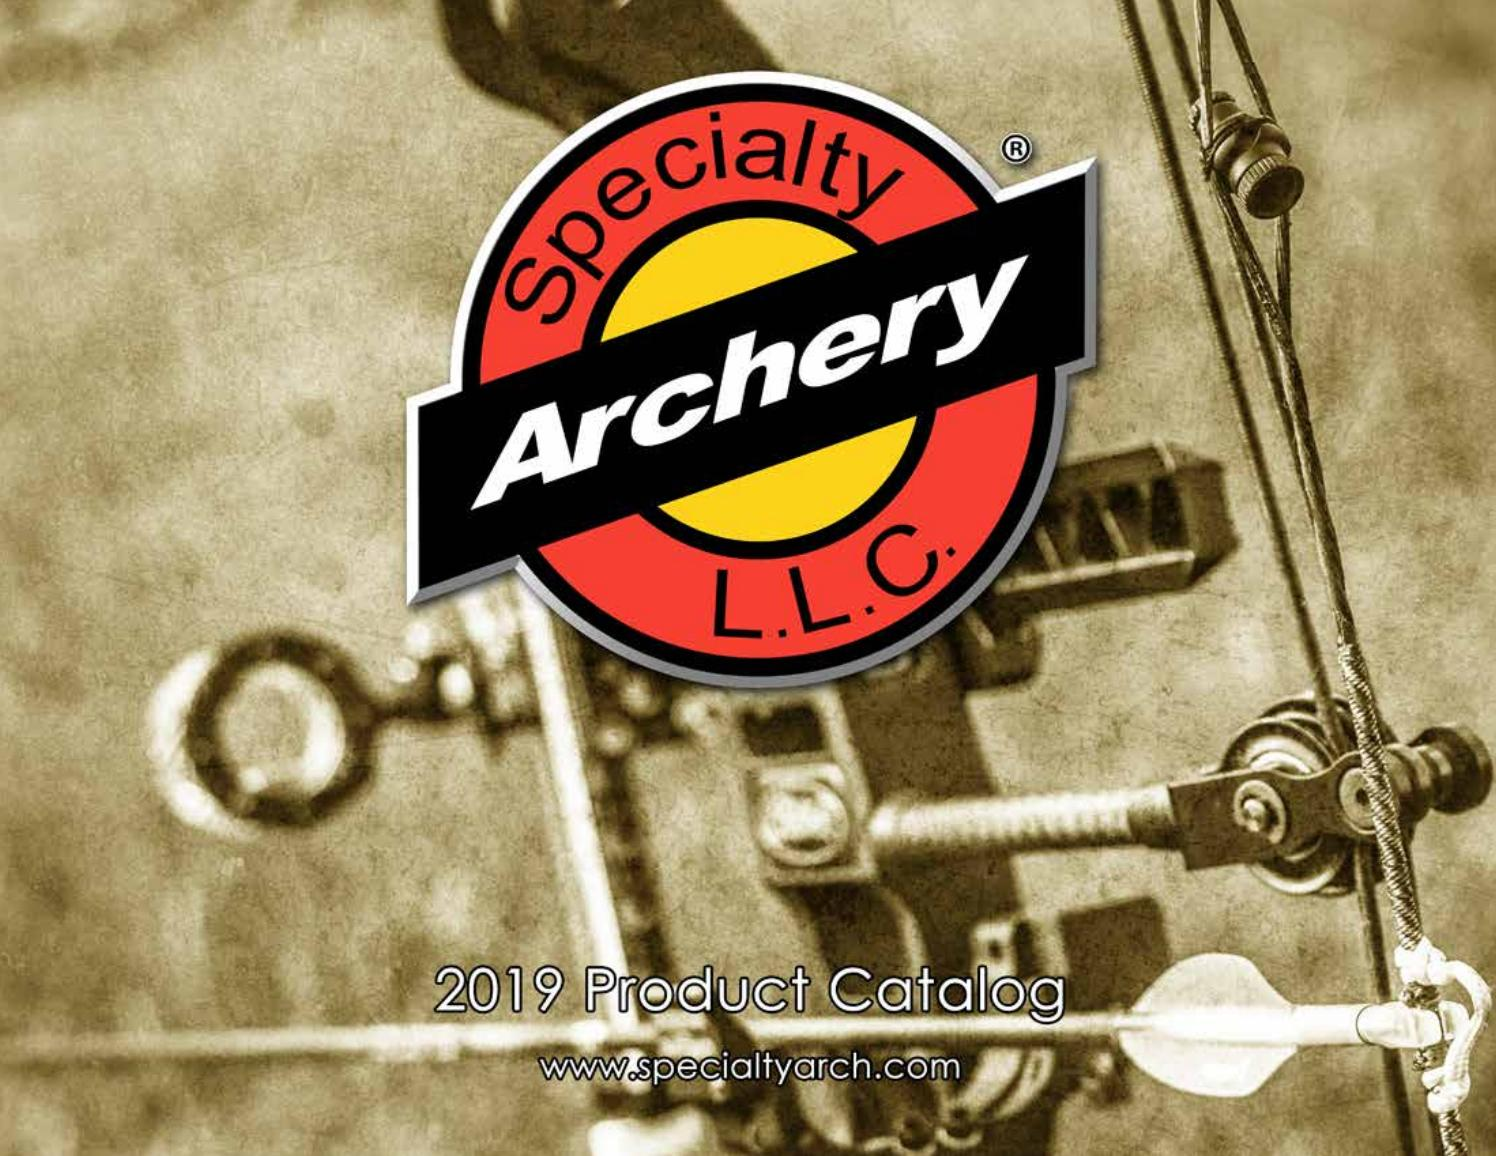 Specialty Archery Super 7 Bright Sight